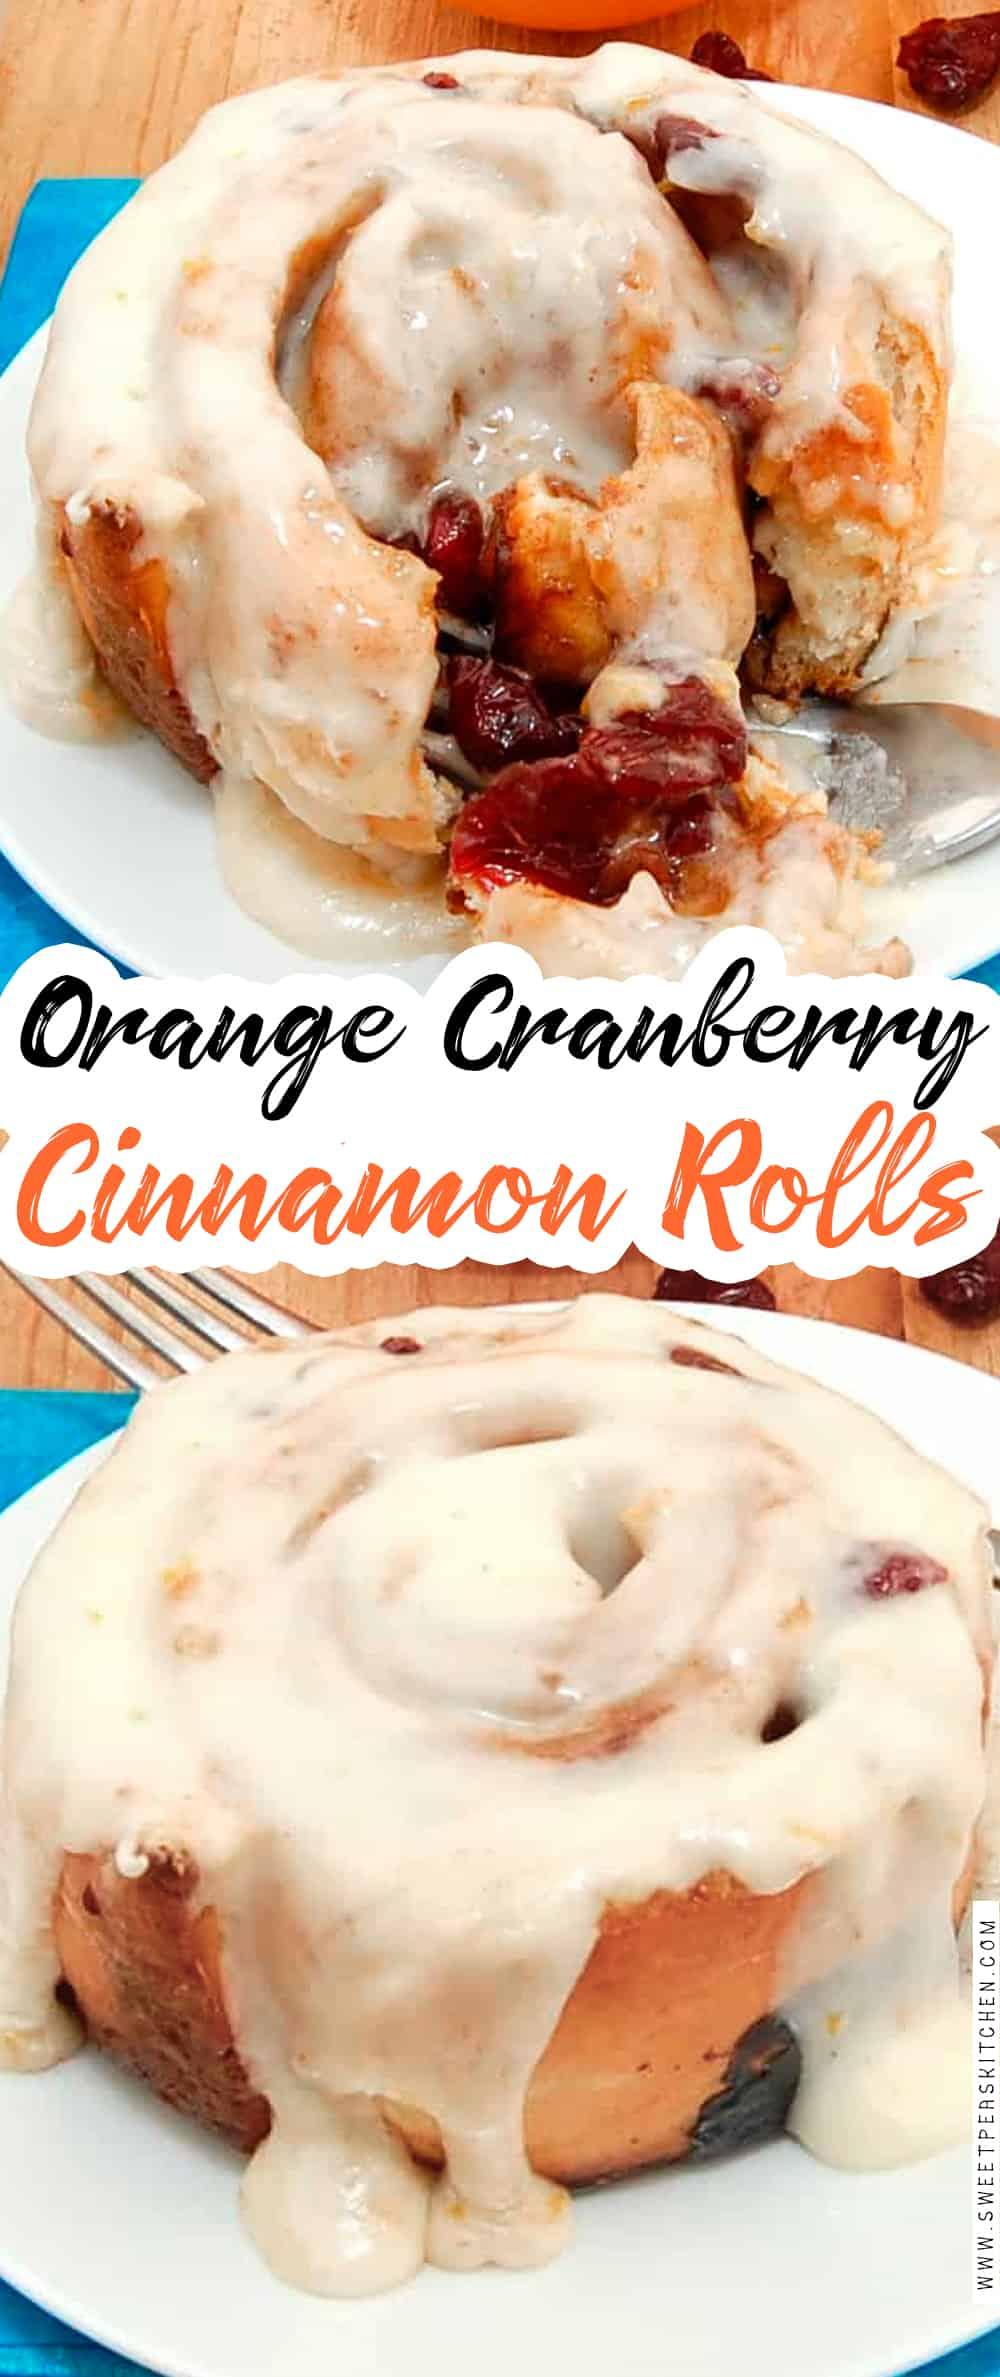 Orange Cranberry Cinnamon Rolls